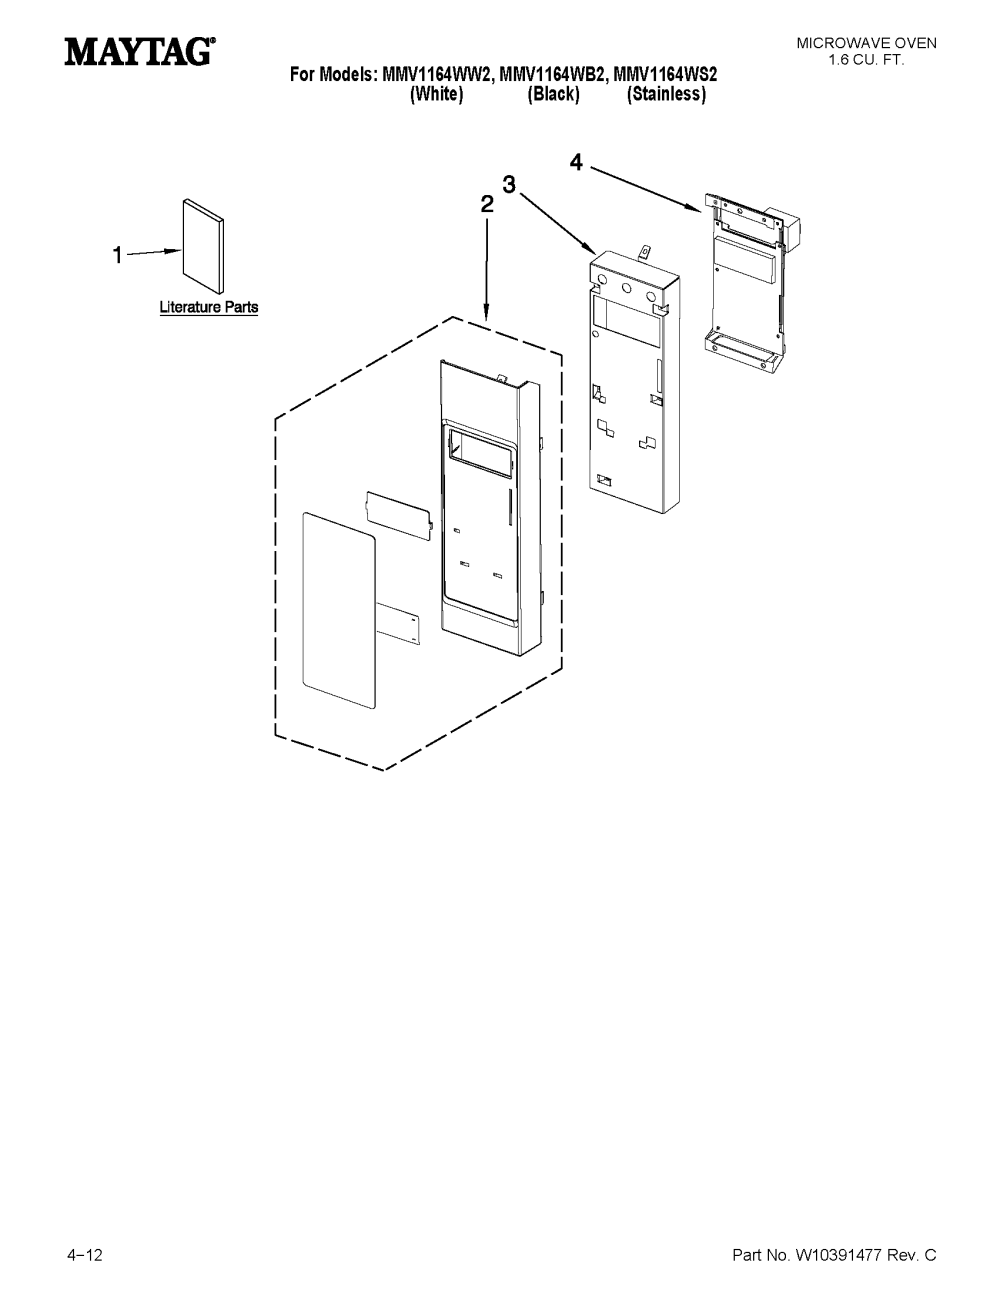 medium resolution of maytag mmv1164ws2 control panel parts diagram